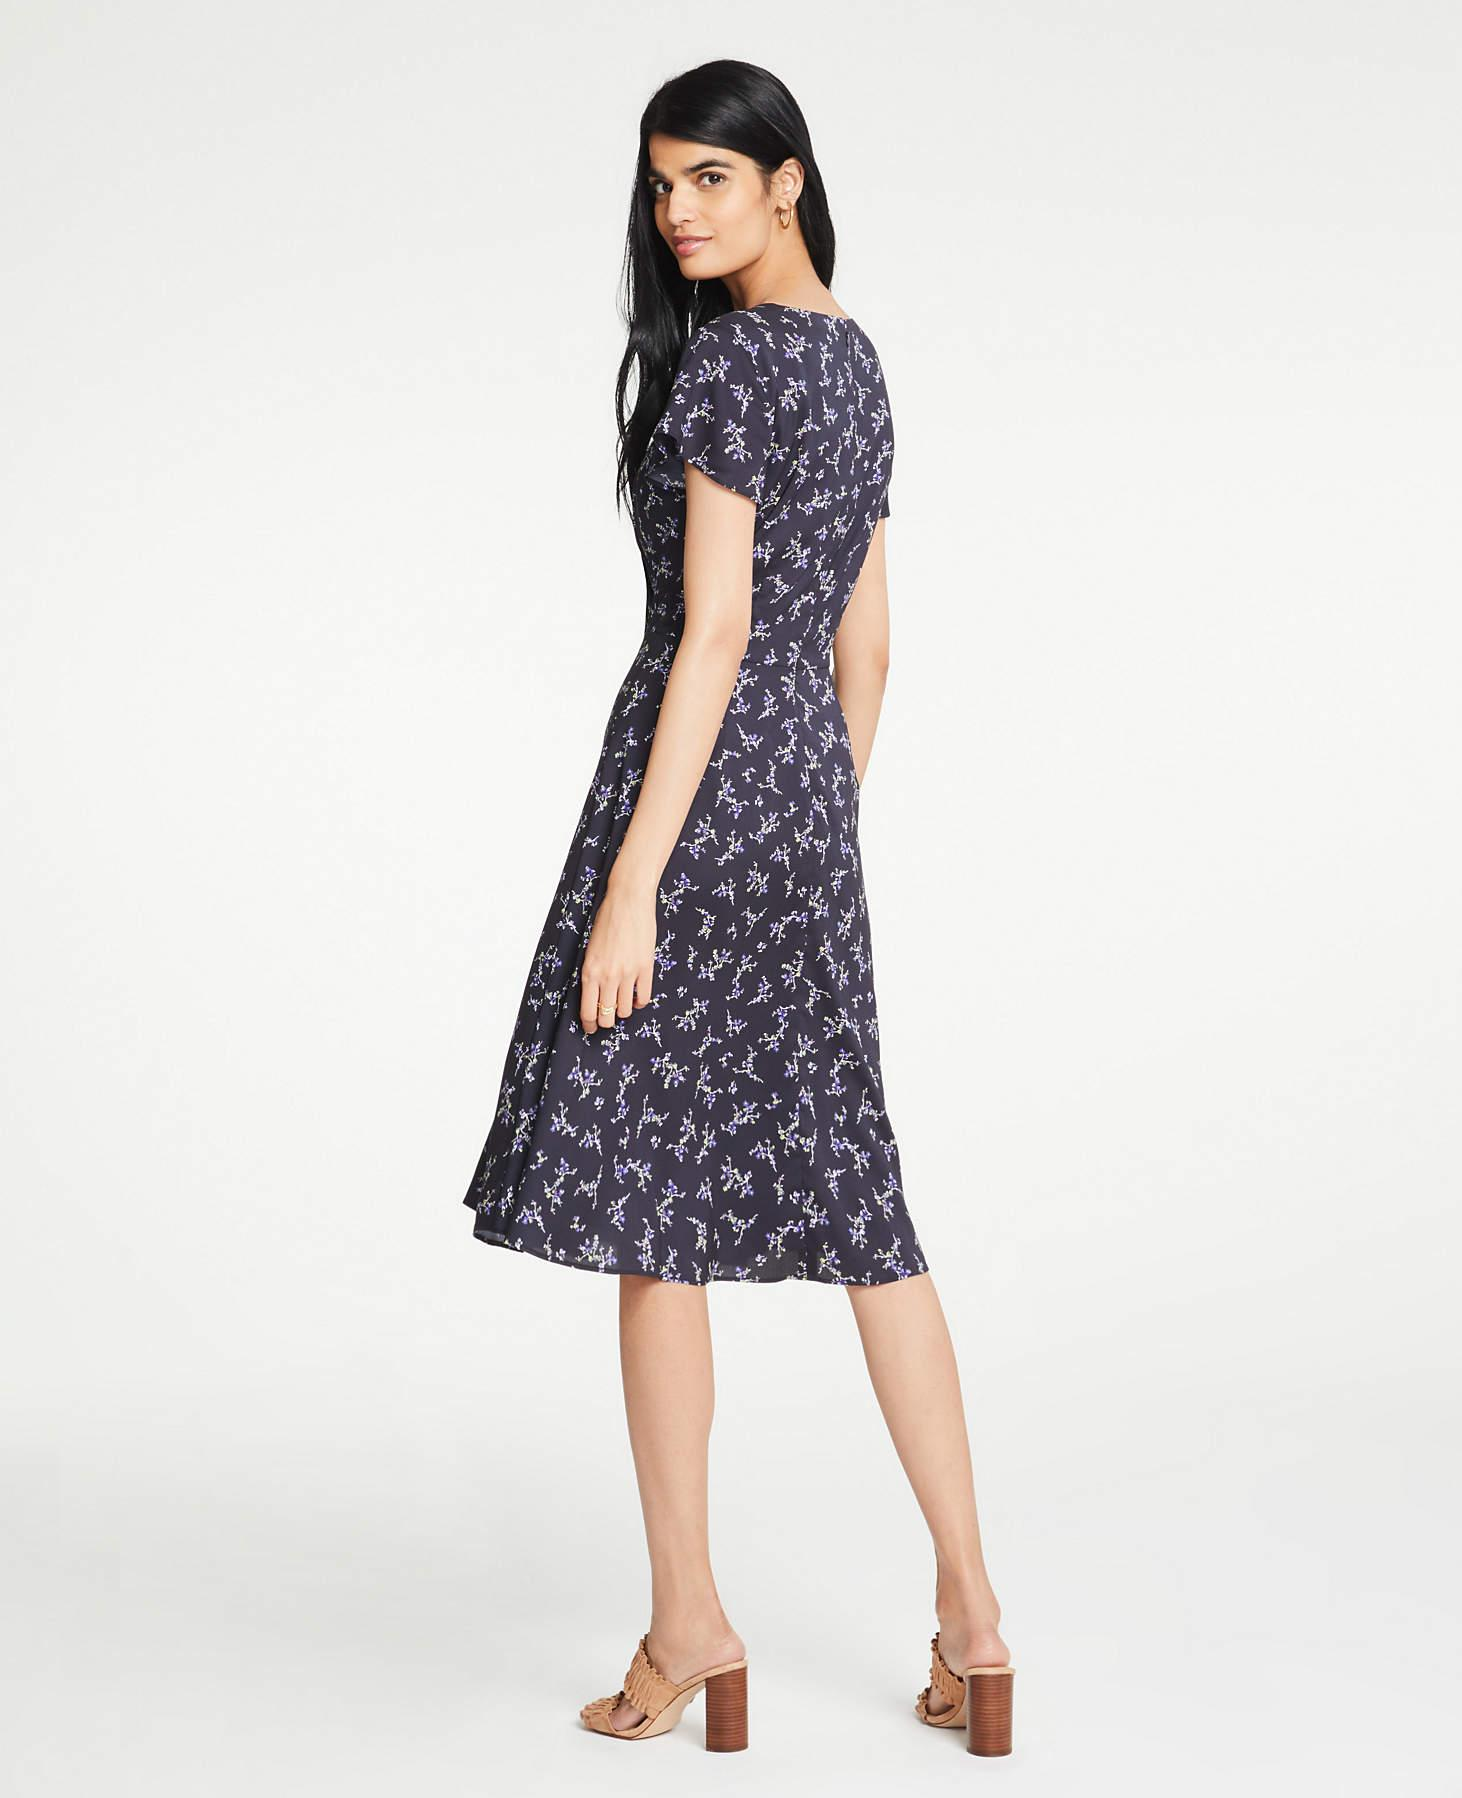 715e7257ec65 Ann Taylor Petite Floral Wrap Flare Dress in Blue - Lyst